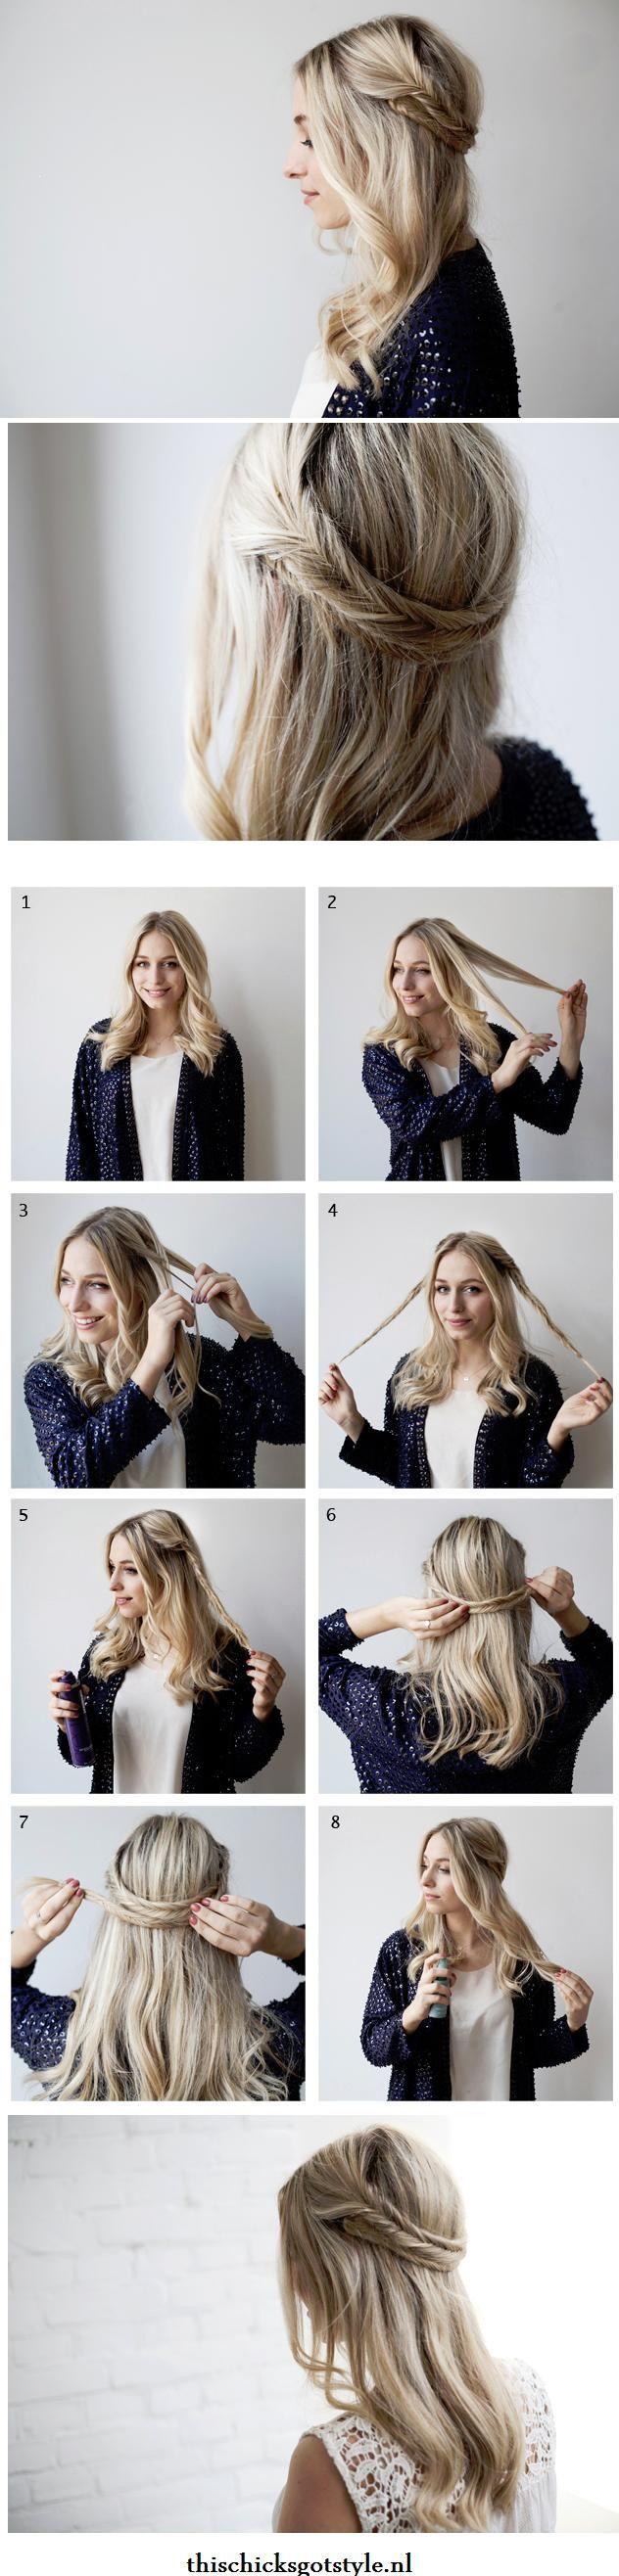 easy hair tutorials for long and short hair headband tutorial